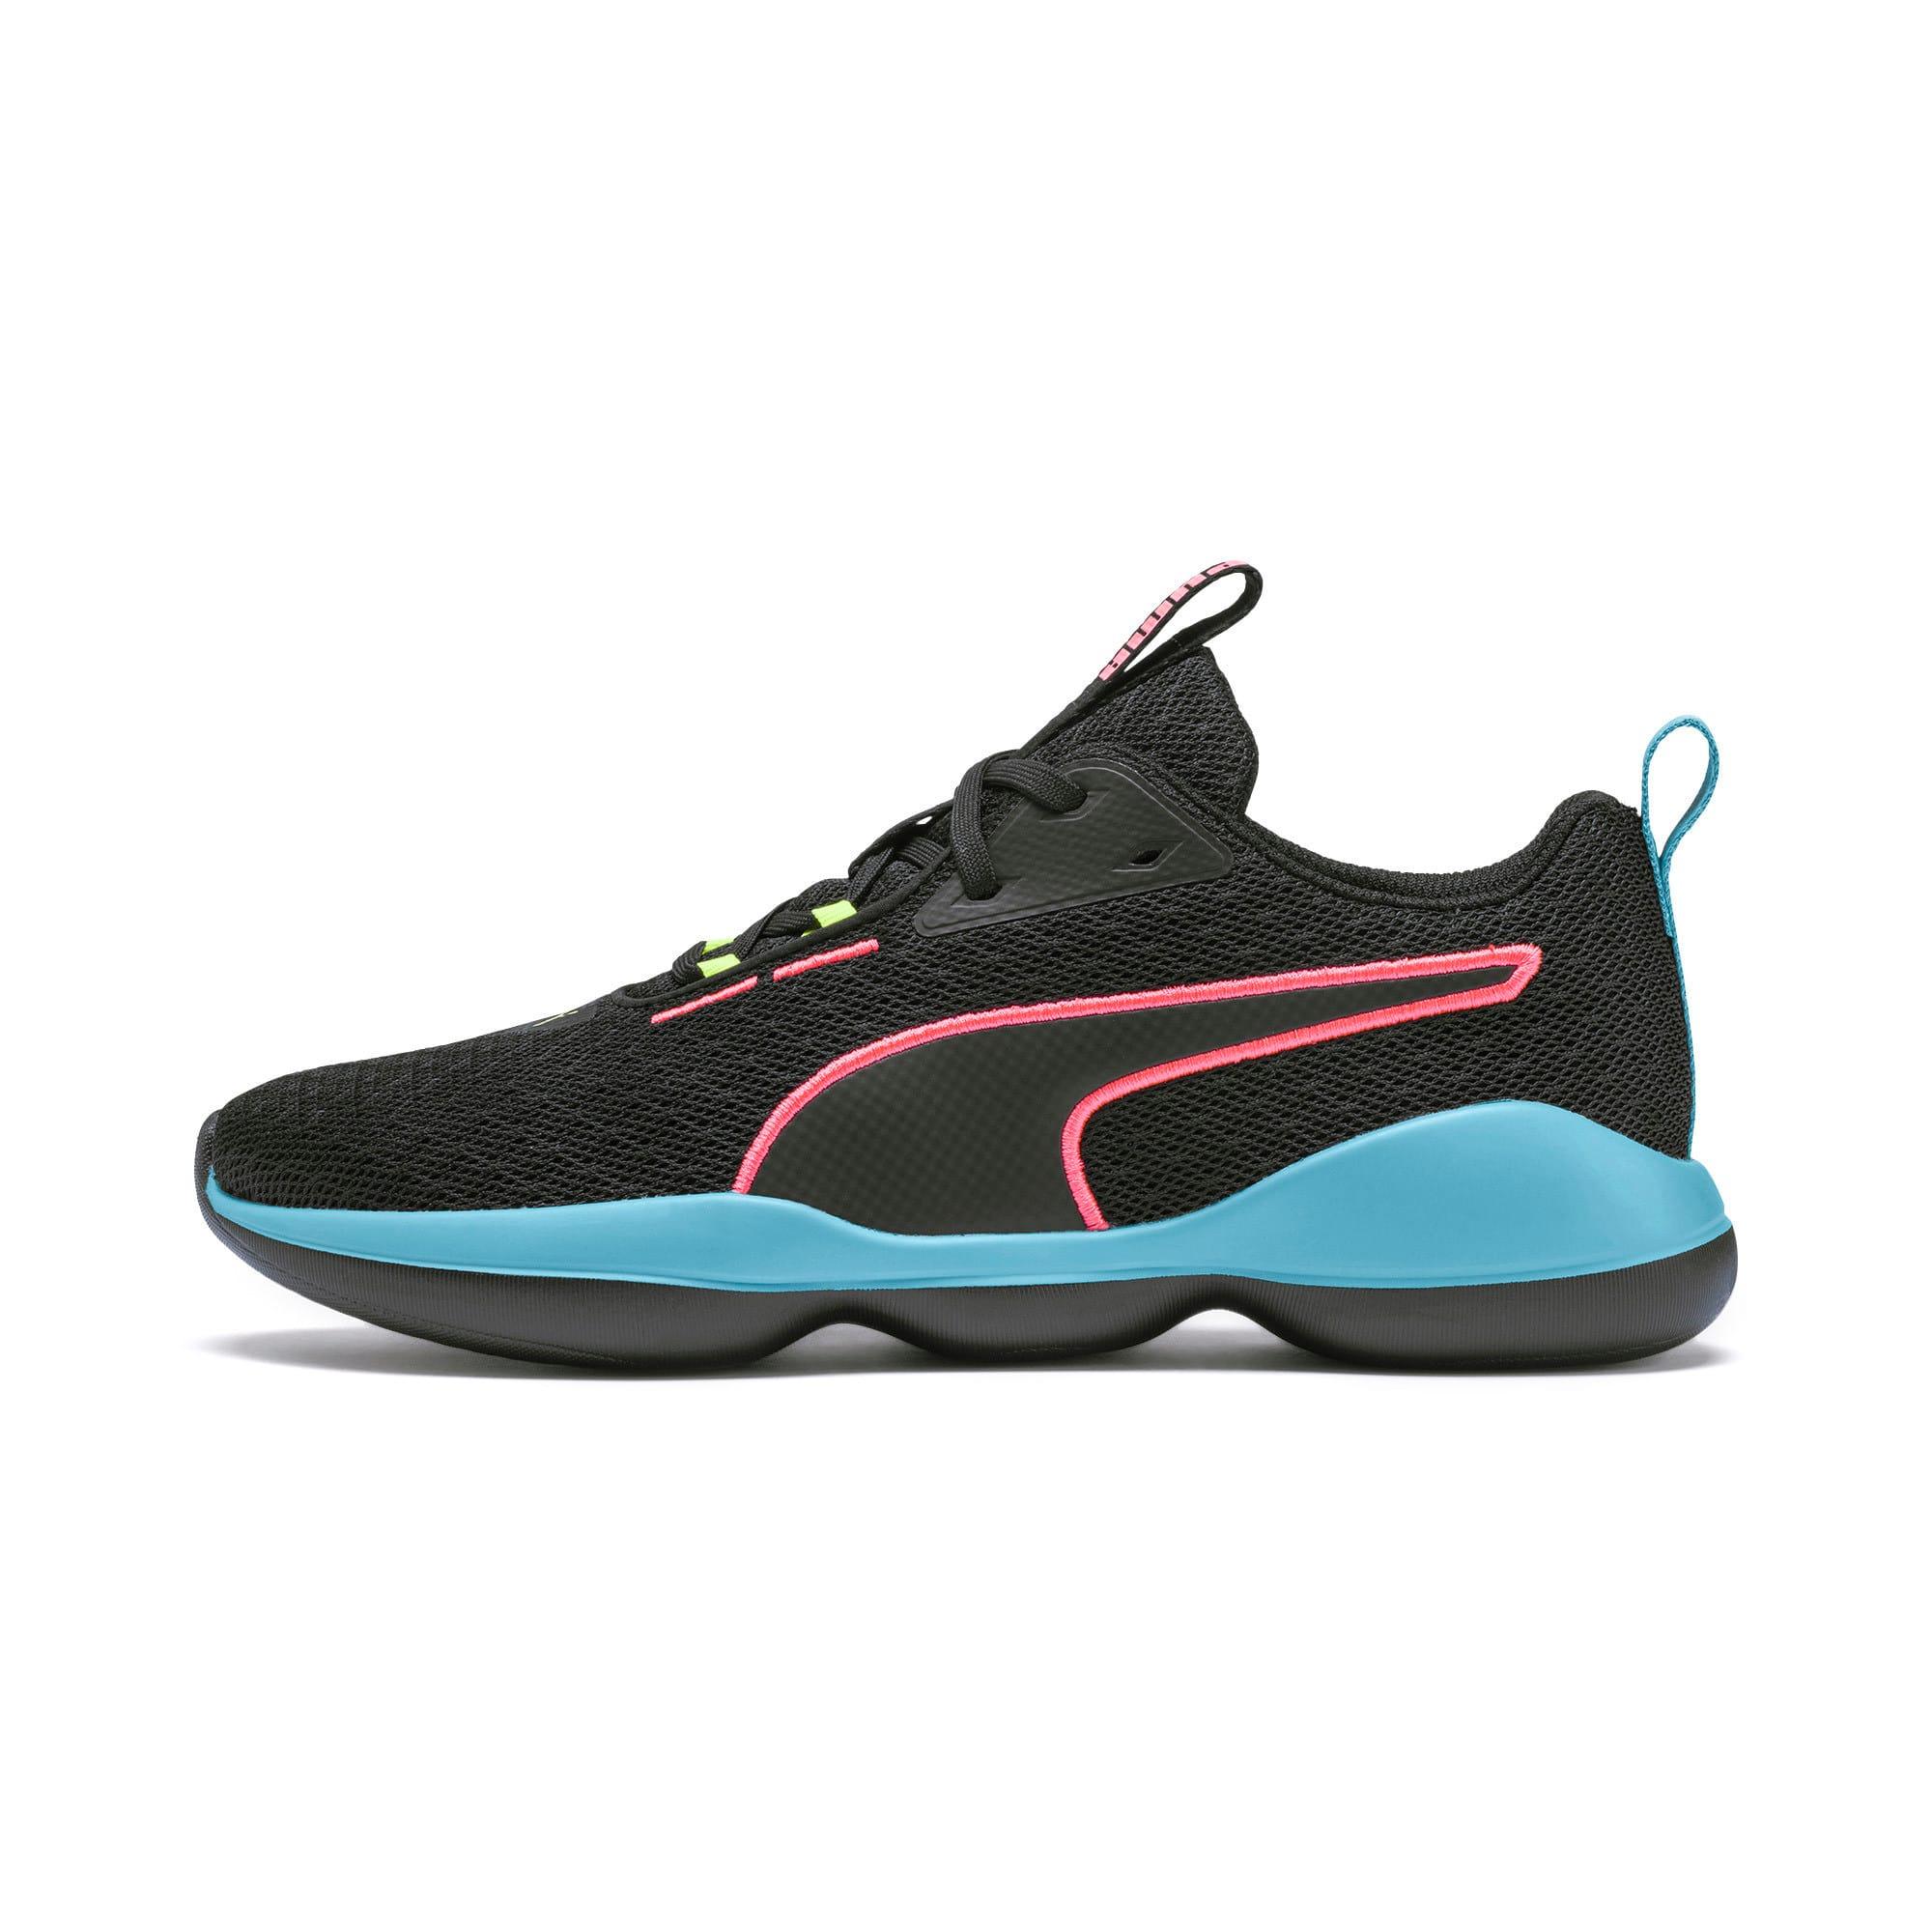 Thumbnail 1 of Flourish FS Women's Training Shoes, Puma Black-Milky Blue, medium